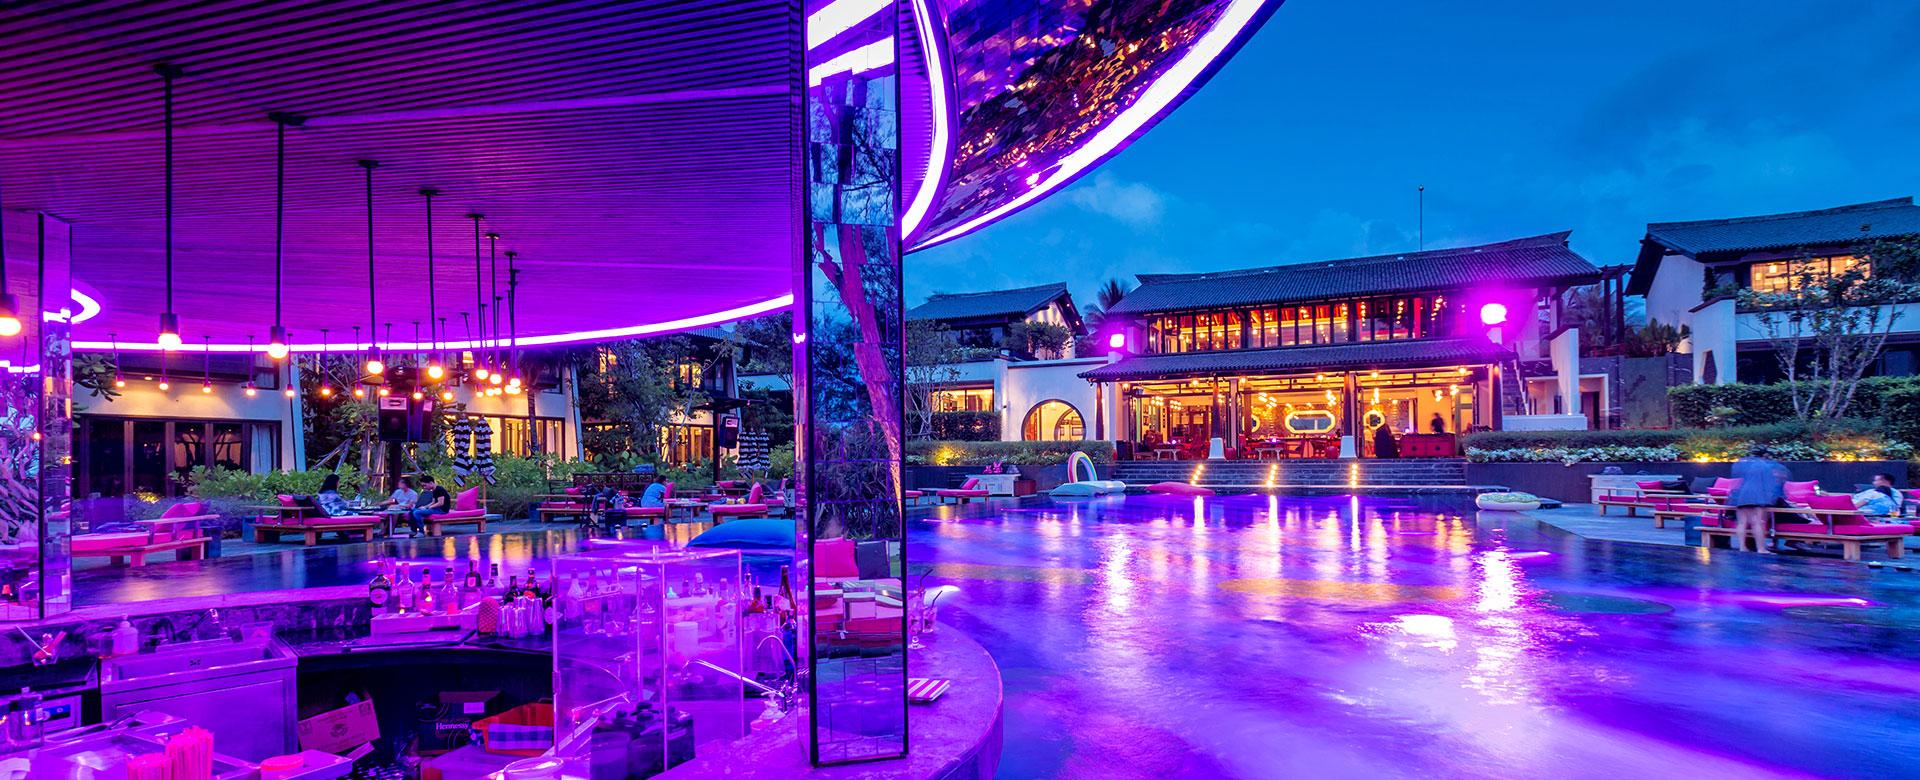 13-Facilities-Baba-Beach-Club-Luxury-Hotel-Phuket-by-Sri-Panwa